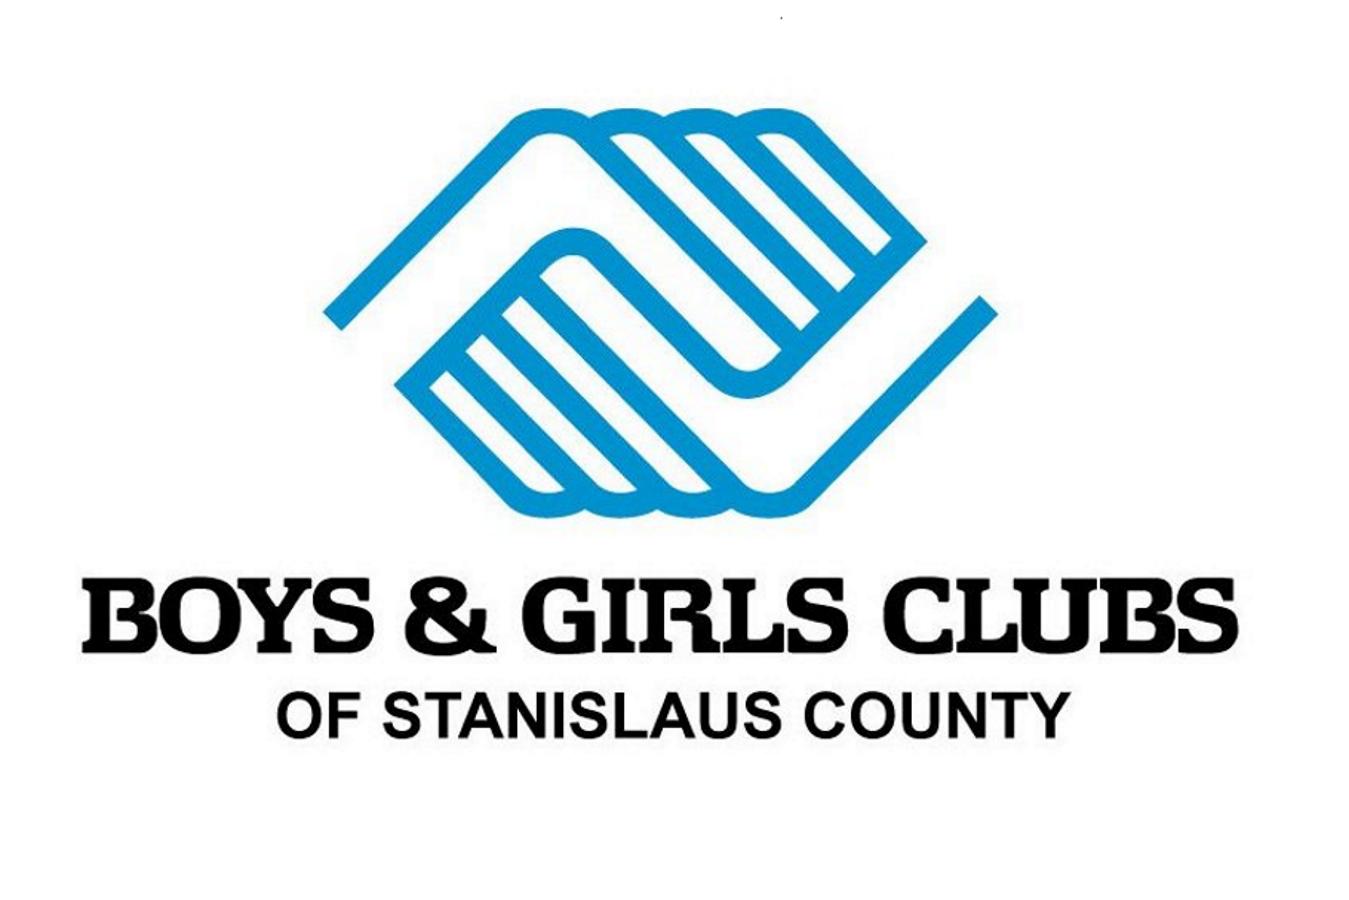 BGC Stan Logo.png